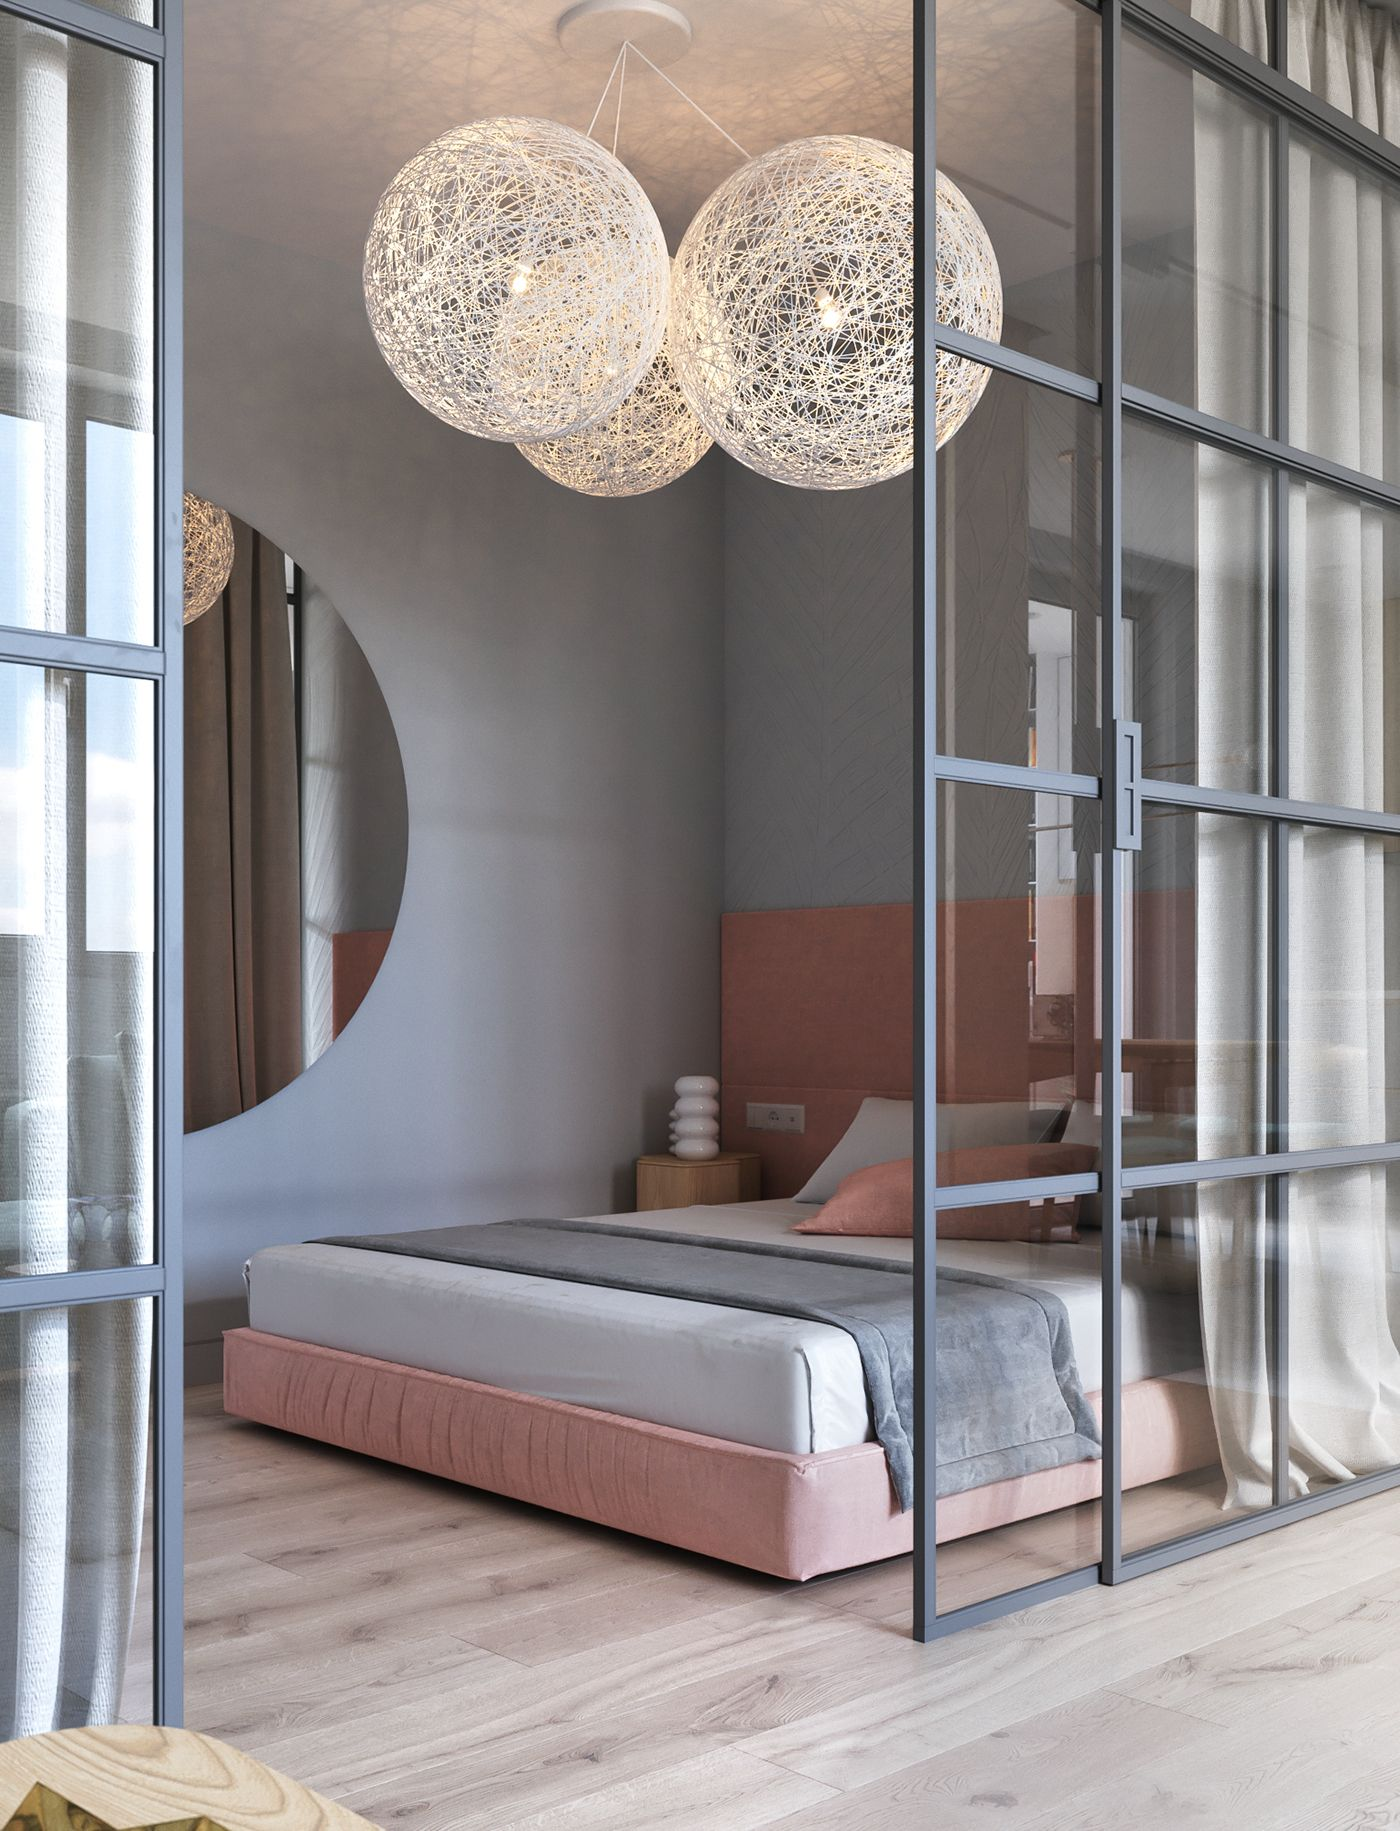 studio apartment, wooden floor, pink bed platform, glass partition, white curtain, round mirror, white large round pendants